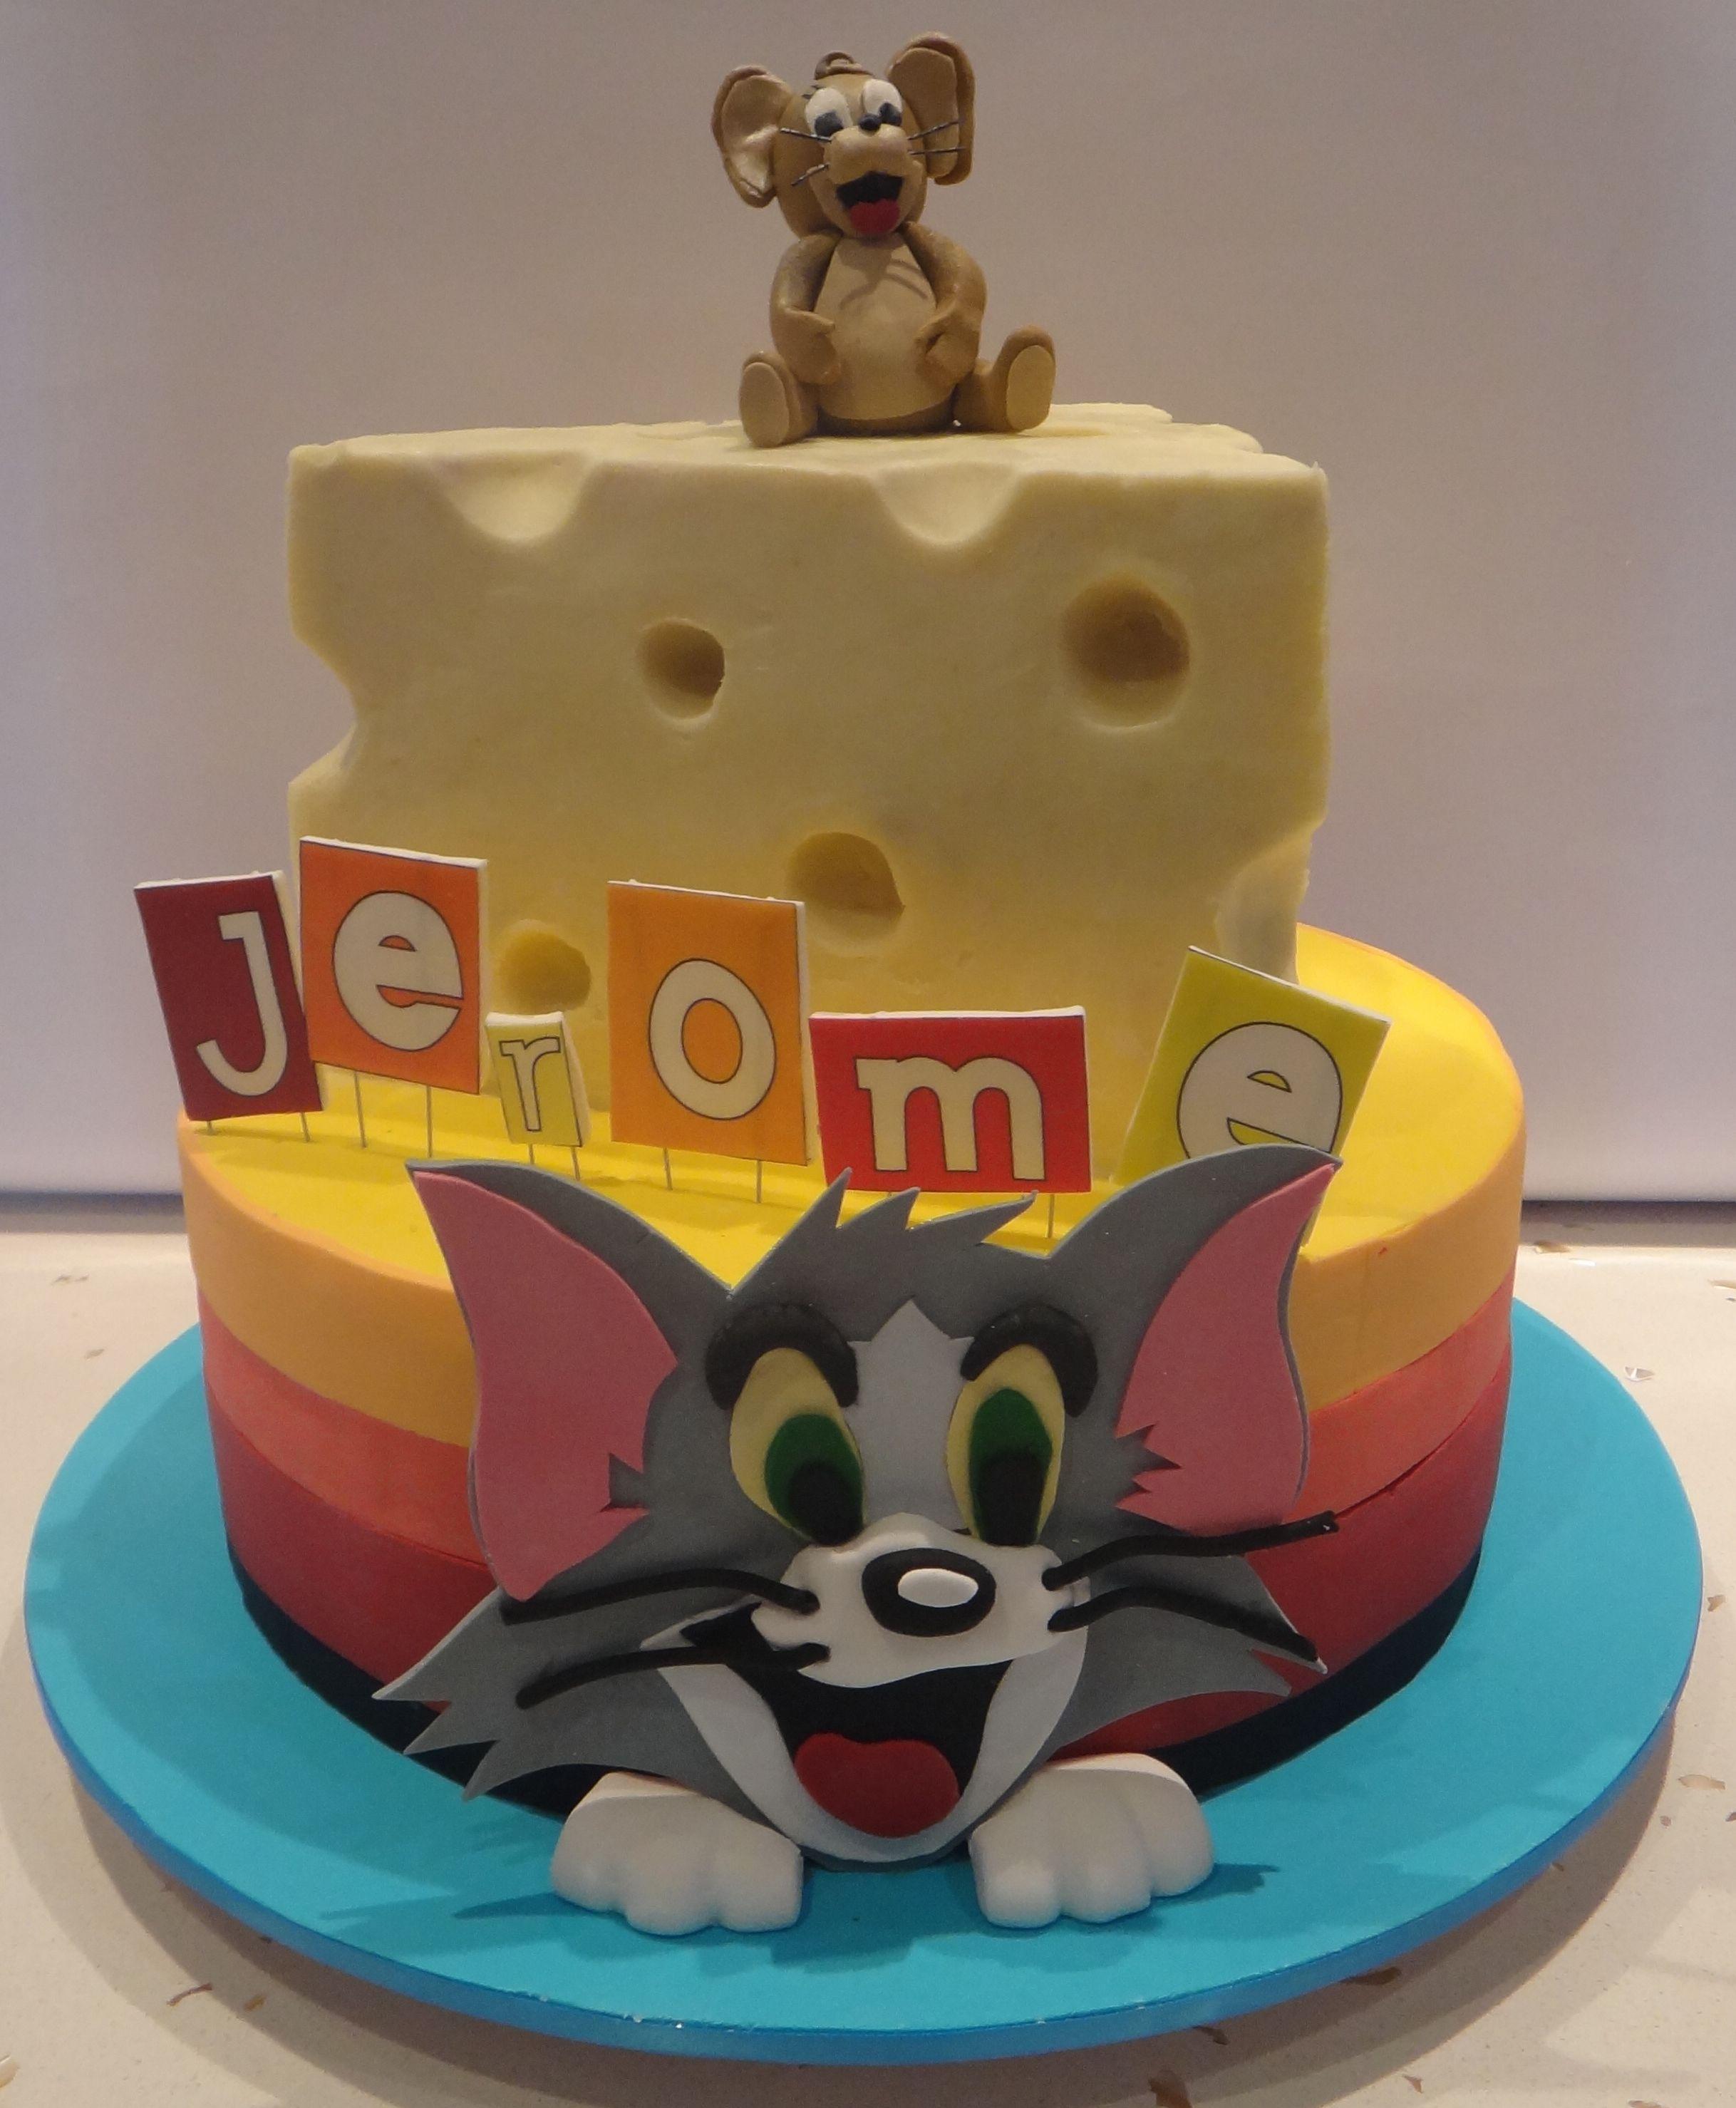 Enjoyable Tom And Jerry Birthday Cake Cartoon Cake Tom And Jerry Cake Birthday Cards Printable Trancafe Filternl